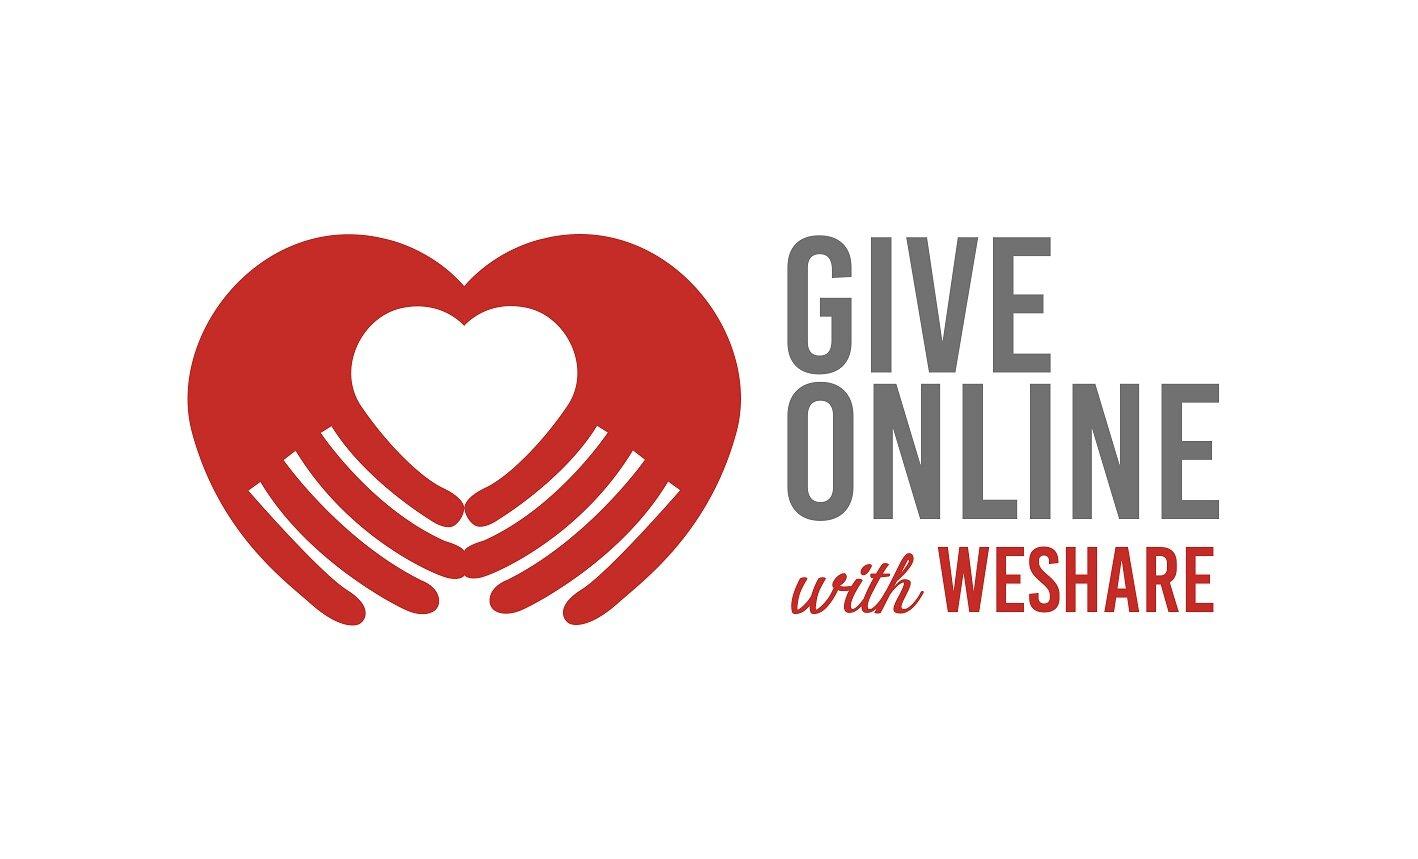 Donate online to St. Joseph of the Holy Family Catholic Church using WeShare 2.jpg